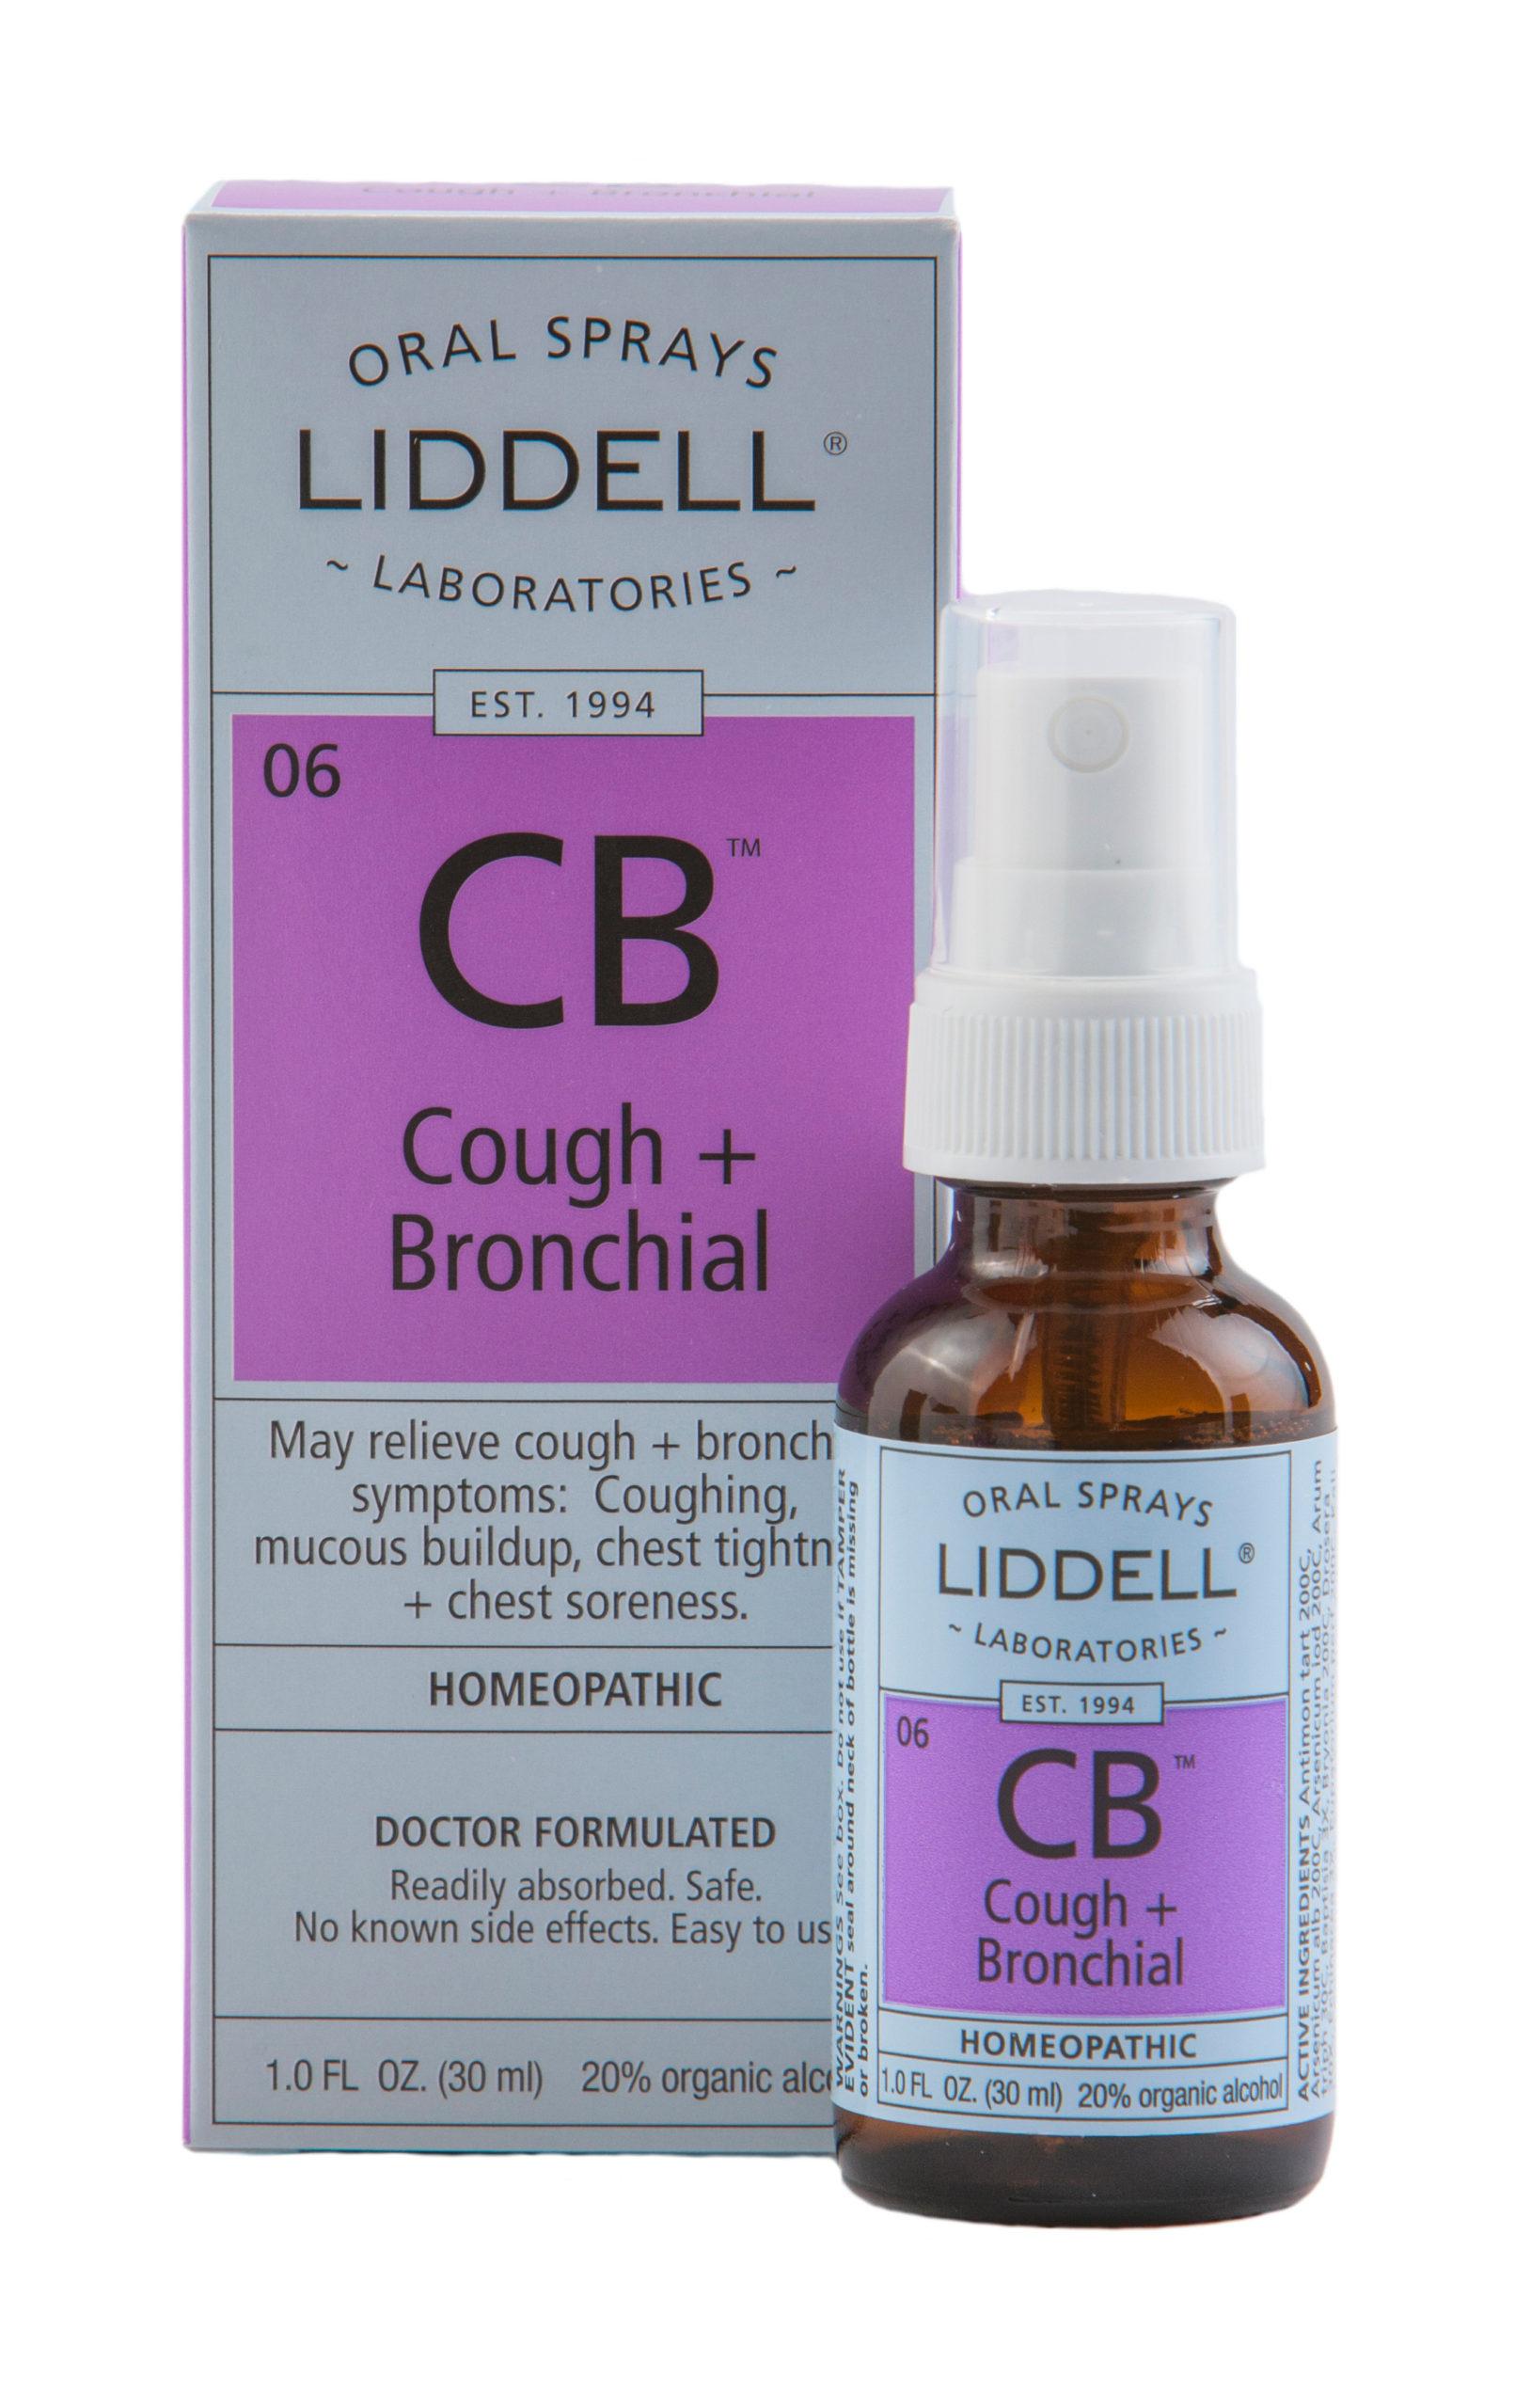 CB, Cough + Bronchial